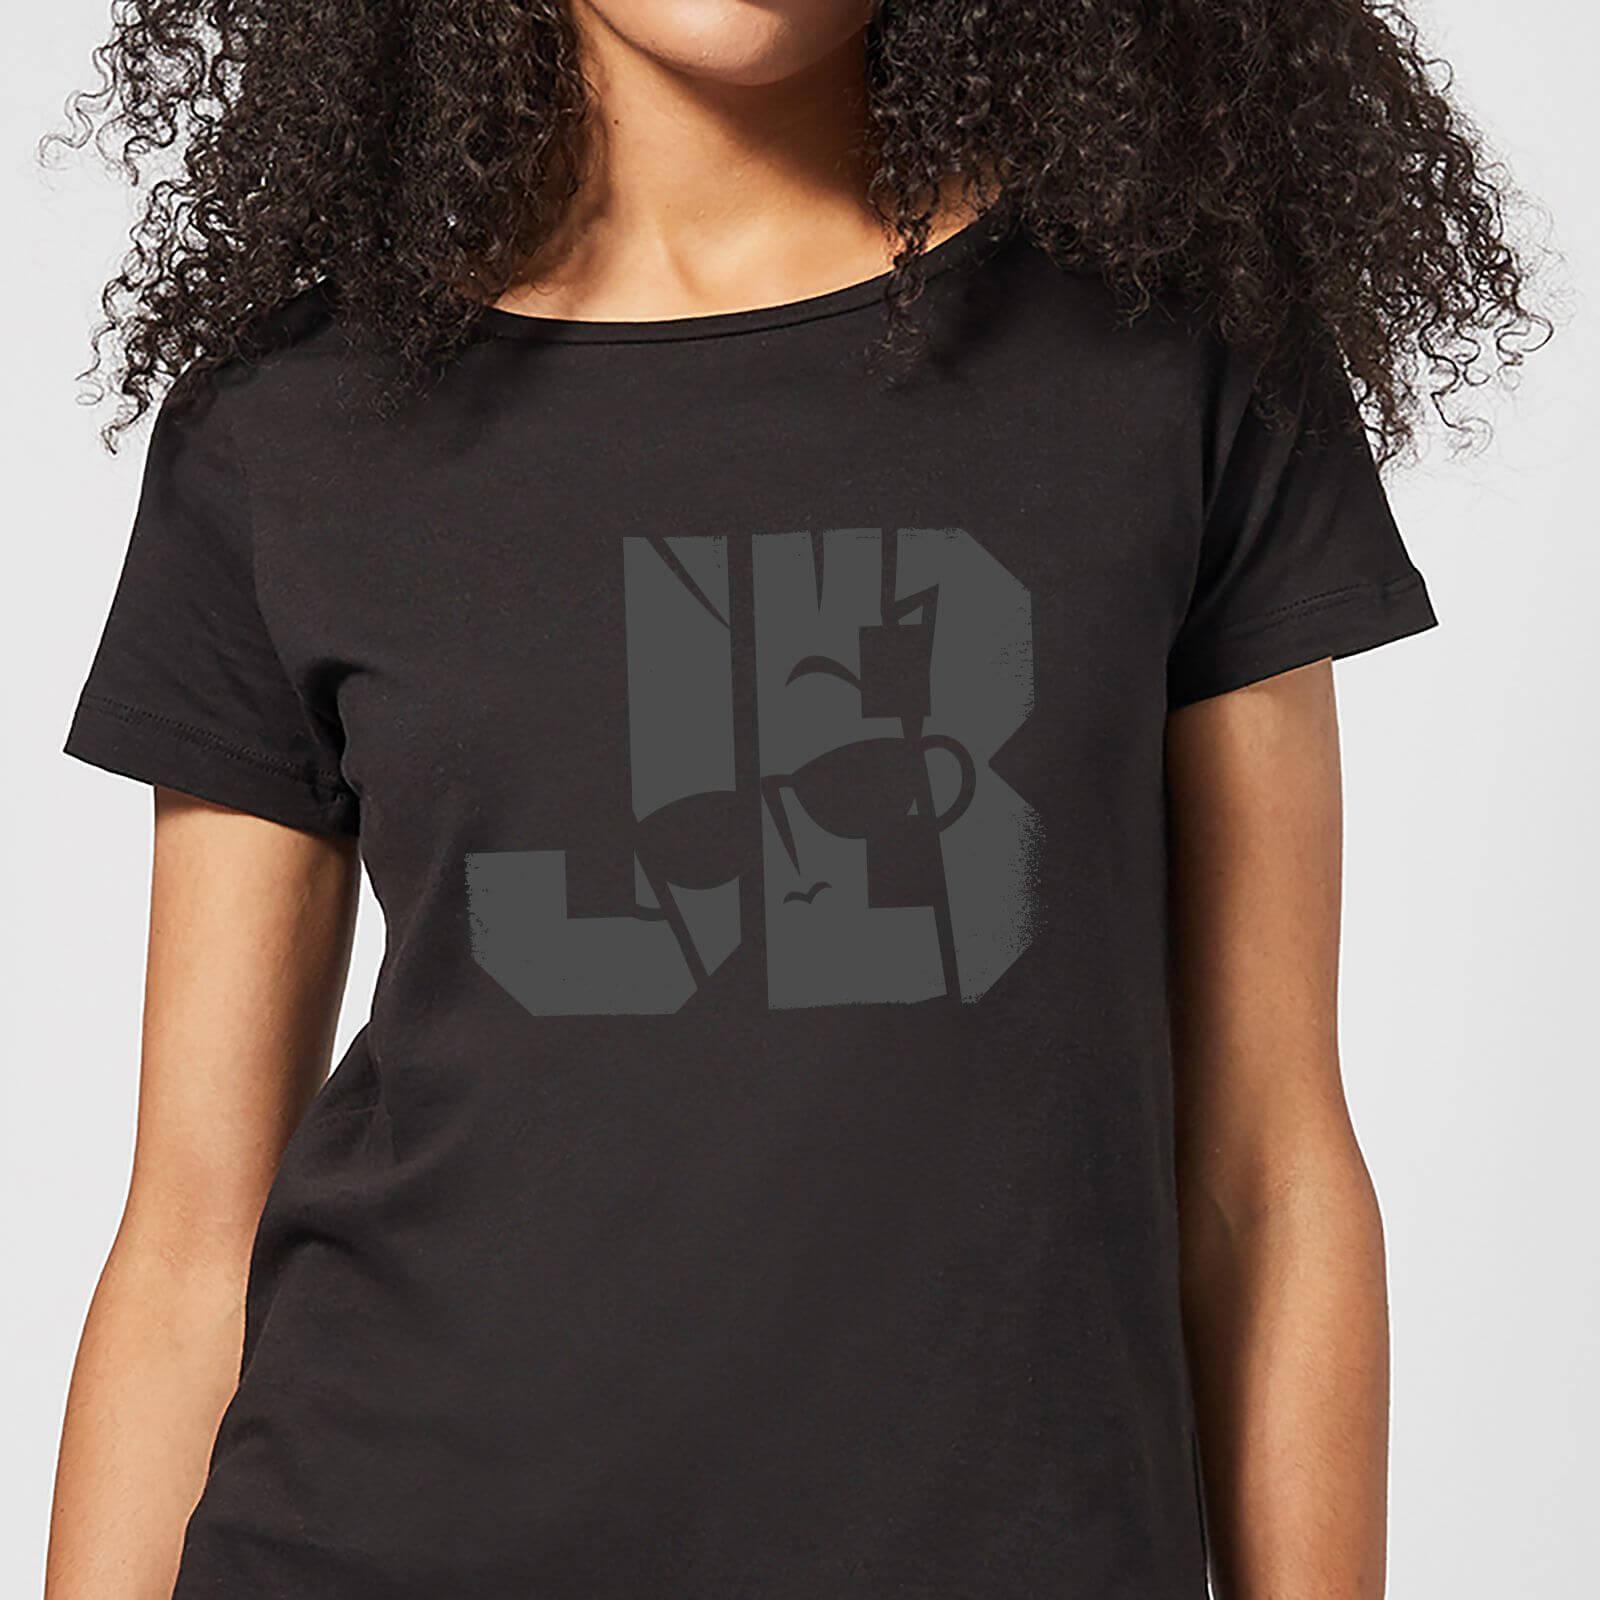 Cartoon Network Johnny Bravo JB Sillhouette Women's T-Shirt - Black - XL - Black